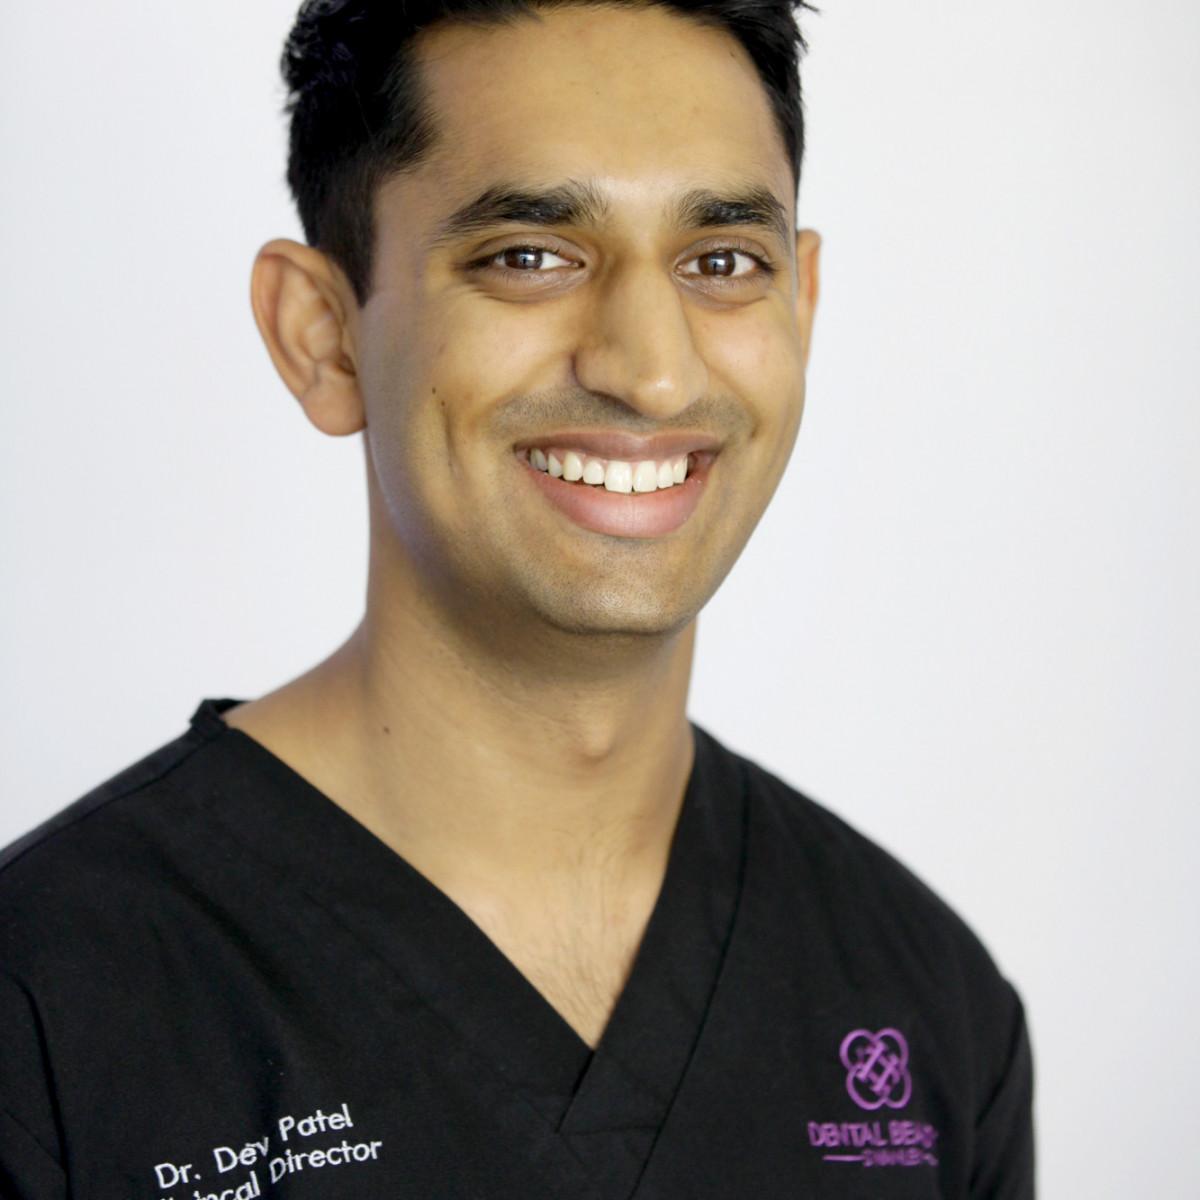 Dr Dev Patel